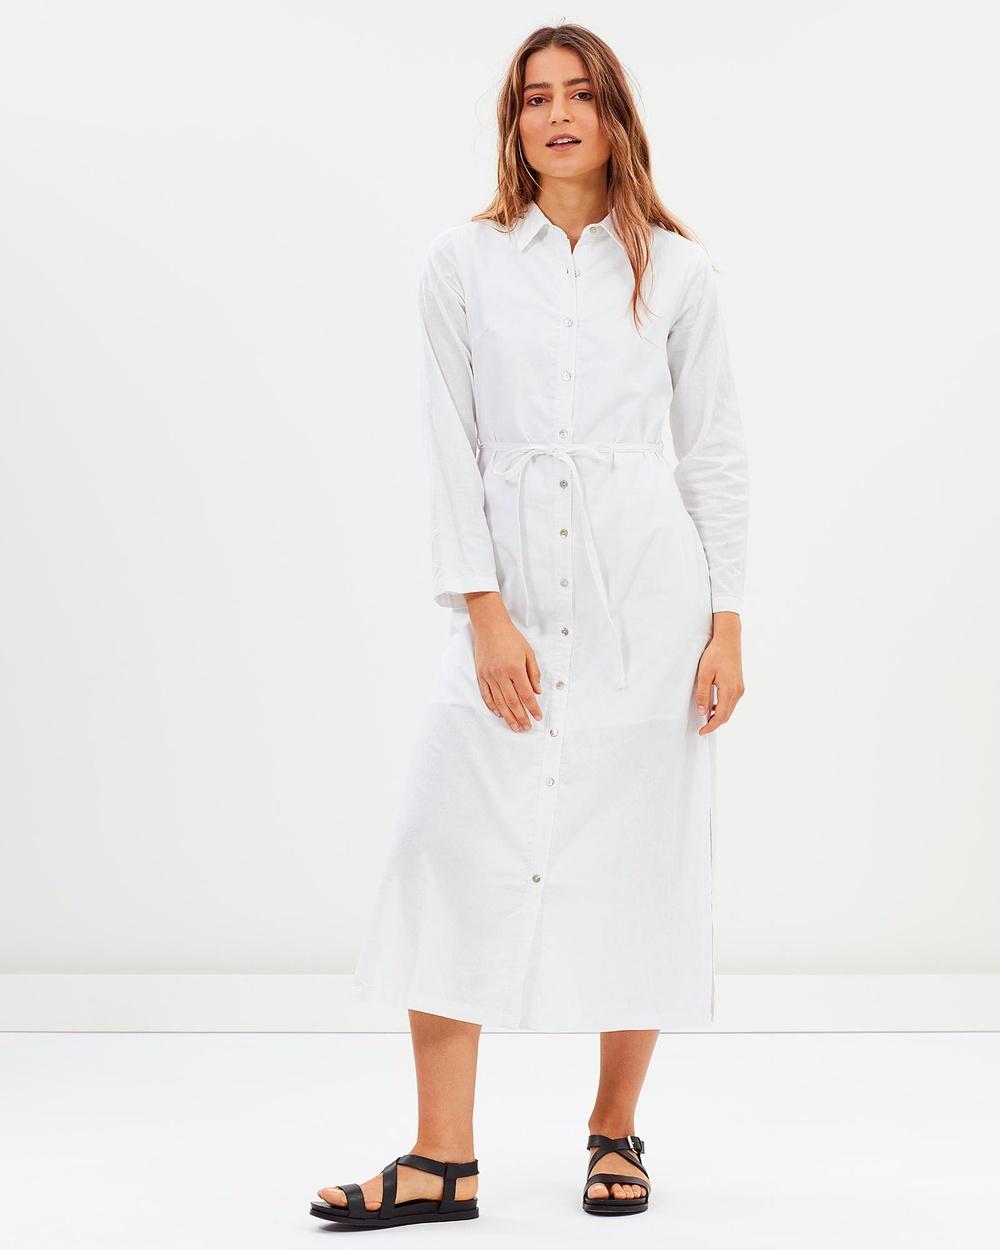 Tee Ink Bayside Maxi Shirt Dress Dresses White Bayside Maxi Shirt Dress